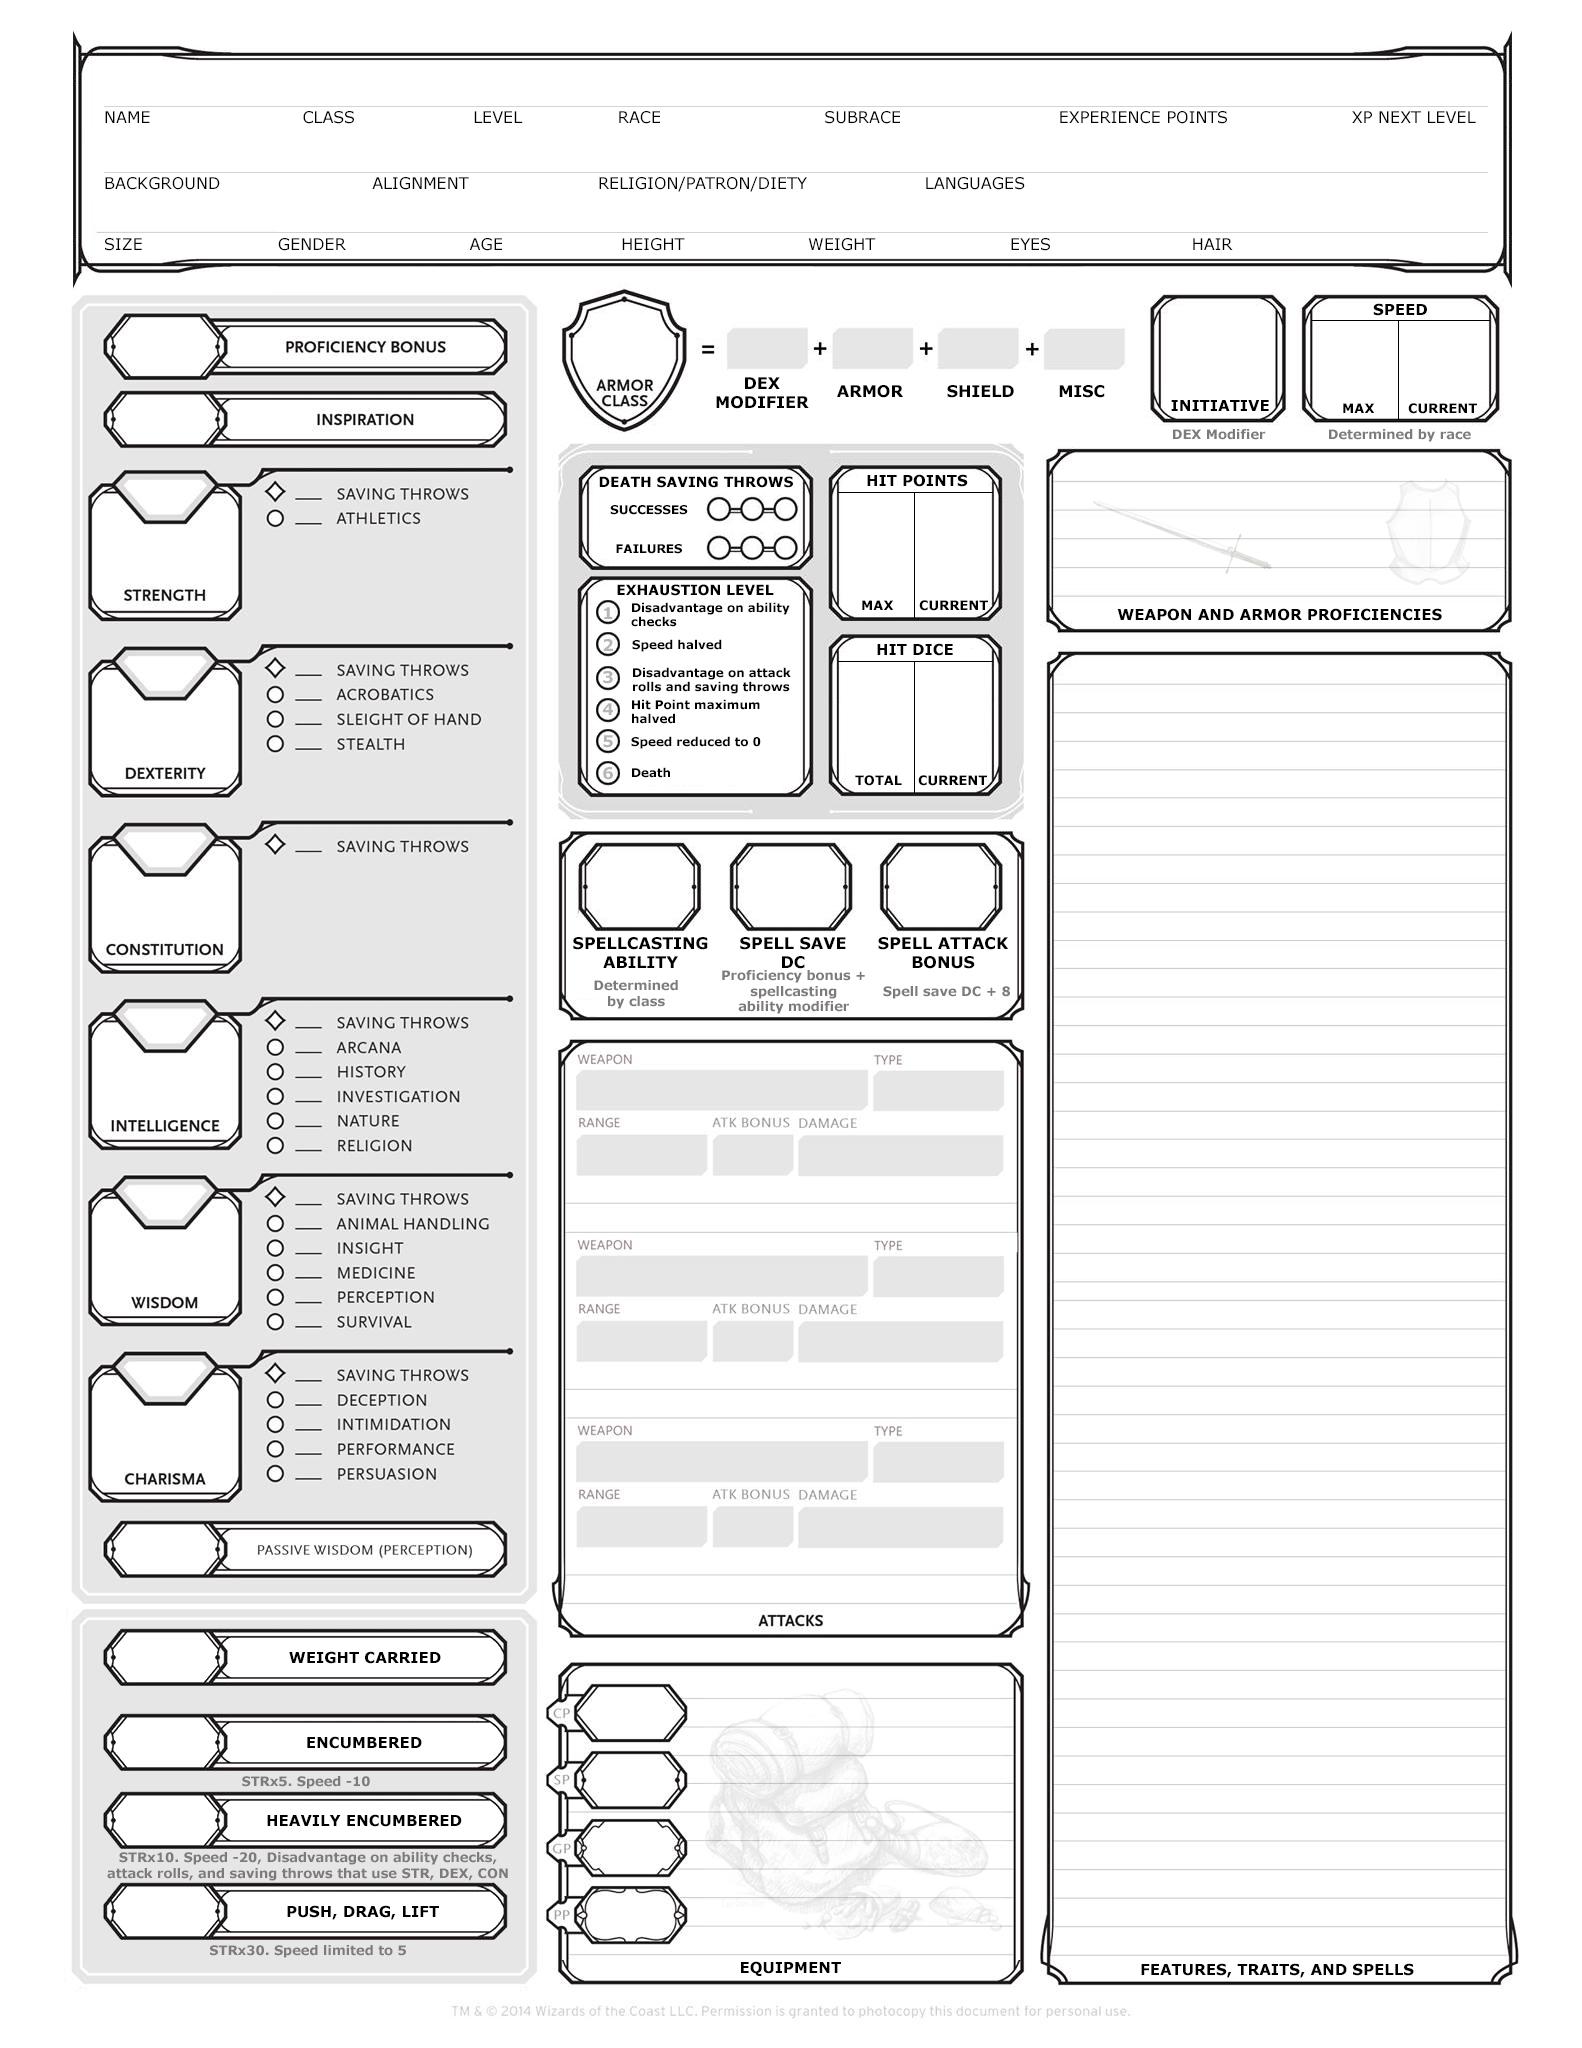 basic dungeons and dragons character sheet basic character sheet aimed at new players, broken down a